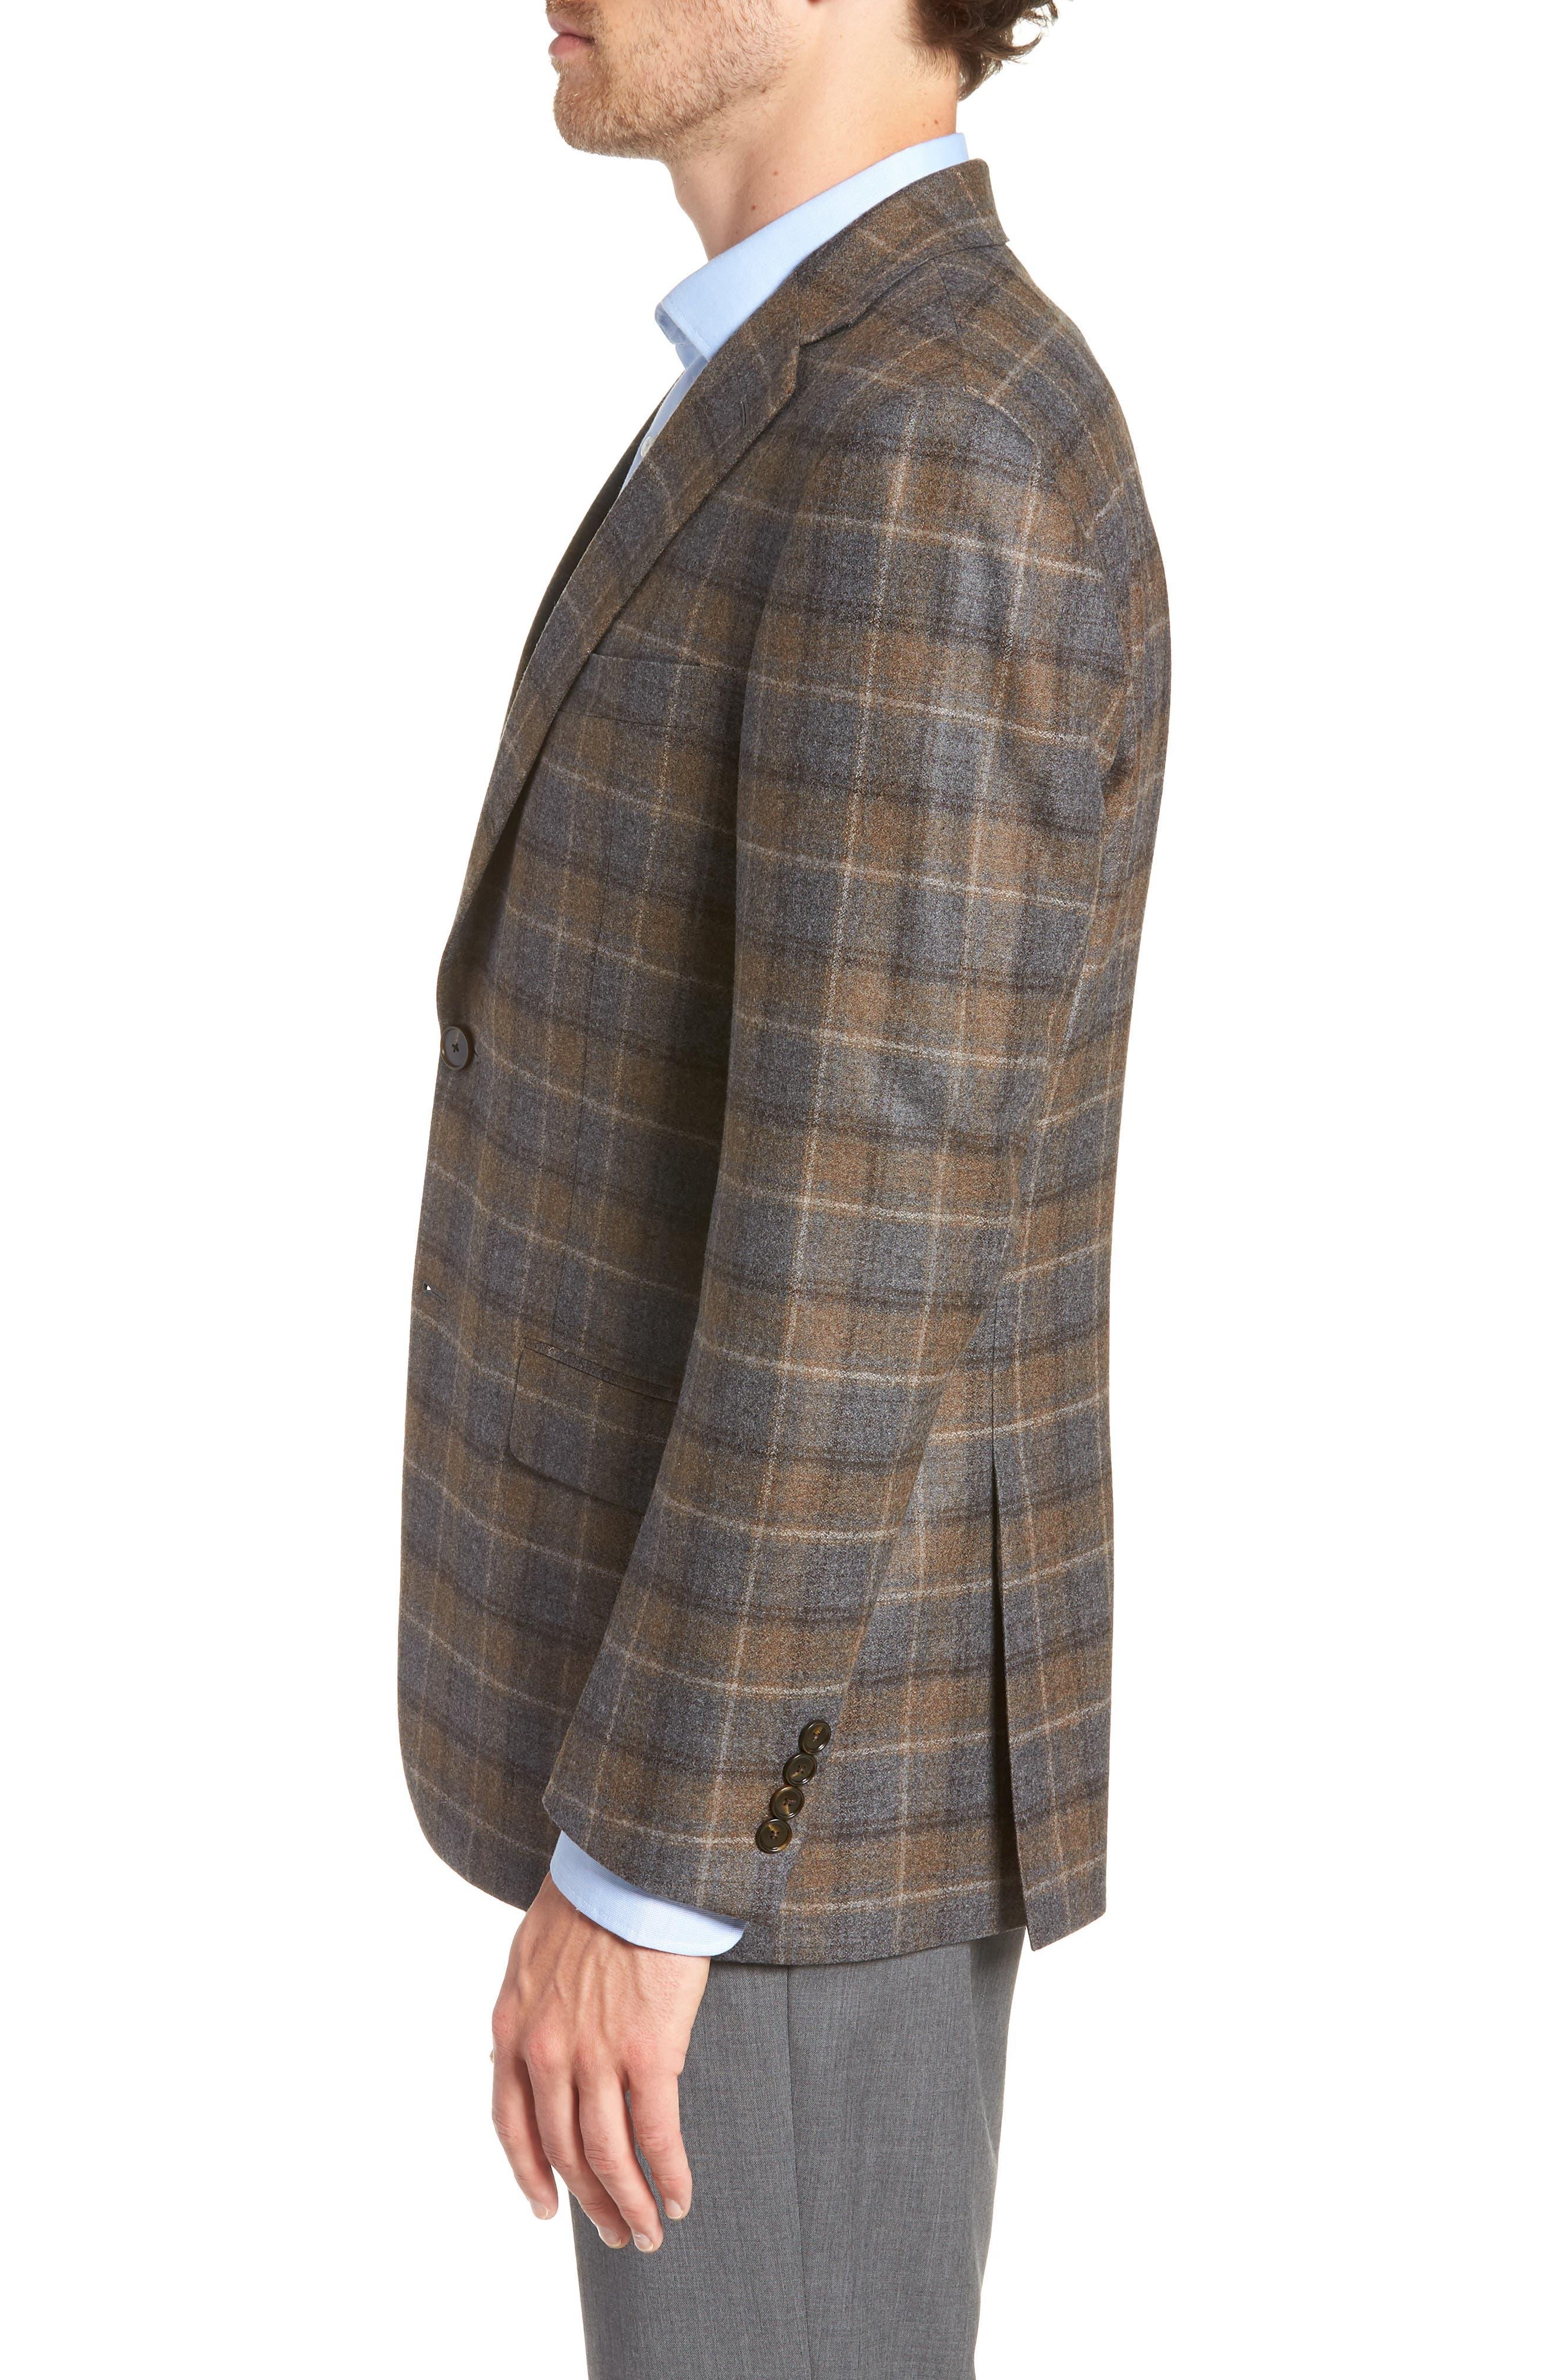 HART SCHAFFNER MARX,                             Classic Fit Plaid Wool Sport Coat,                             Alternate thumbnail 3, color,                             BROWN